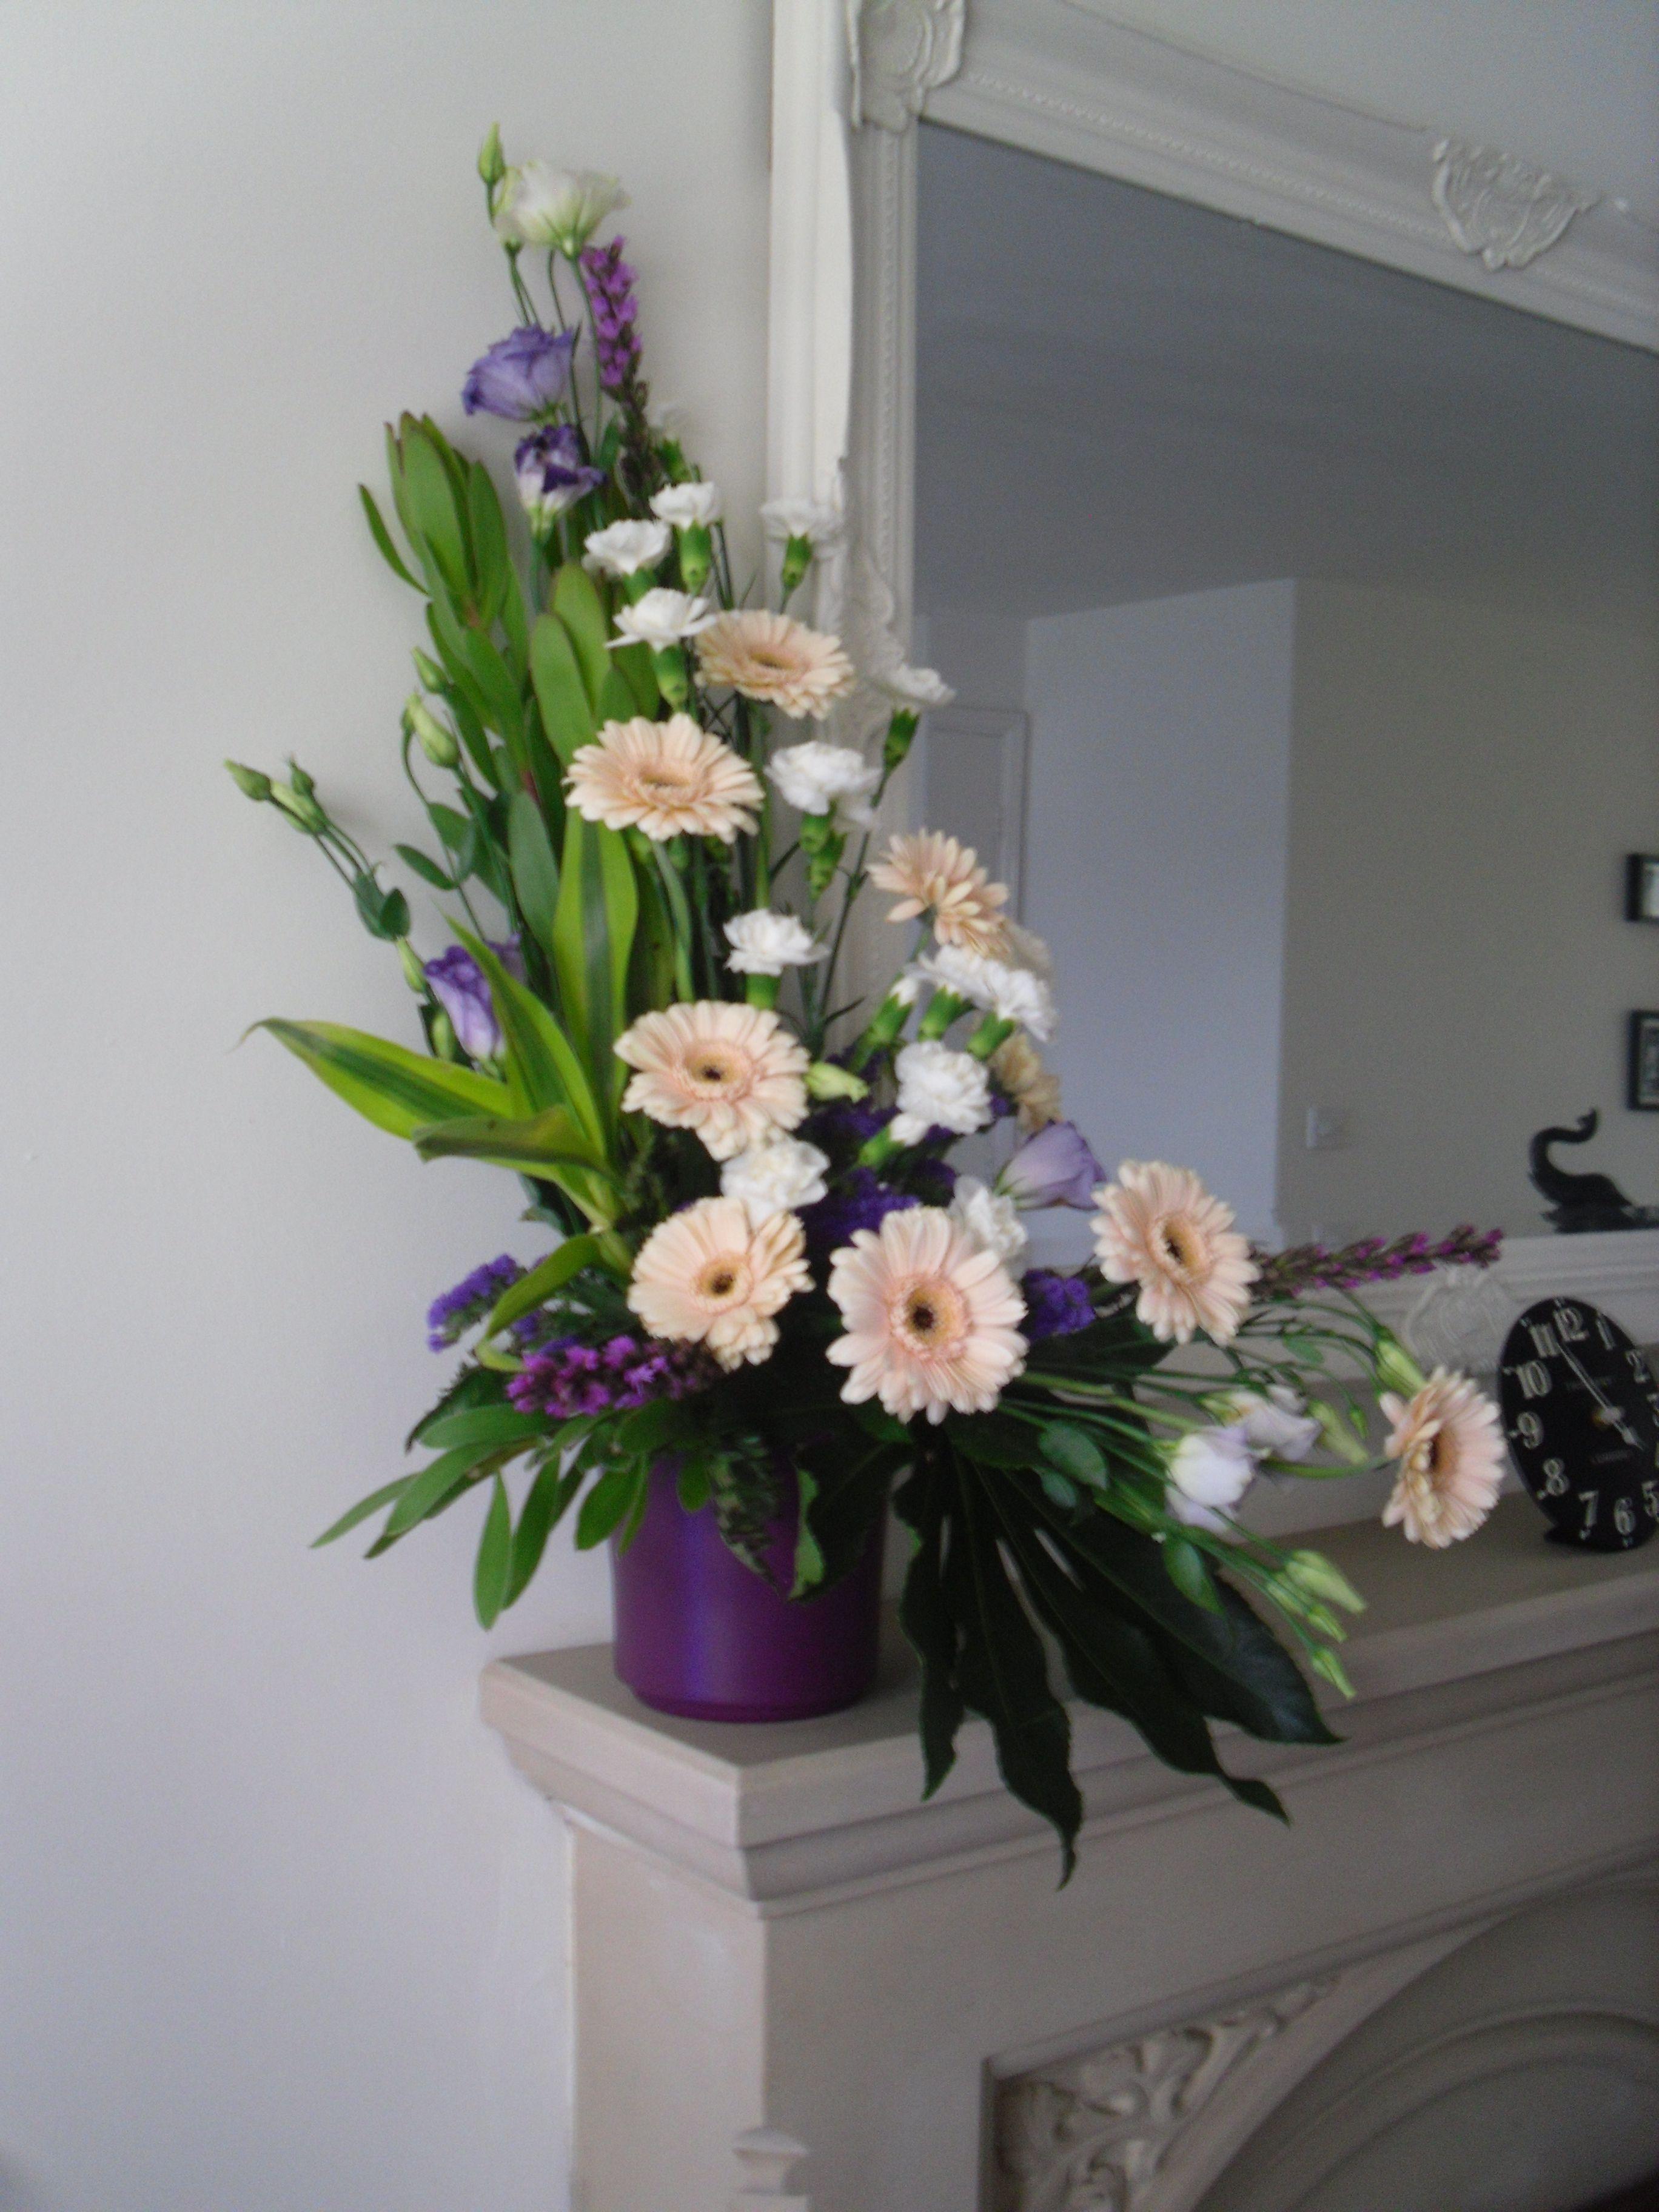 Pin By Isabella Flowers On Work Unique Floral Arrangements Funeral Floral Arrangements Large Floral Arrangements